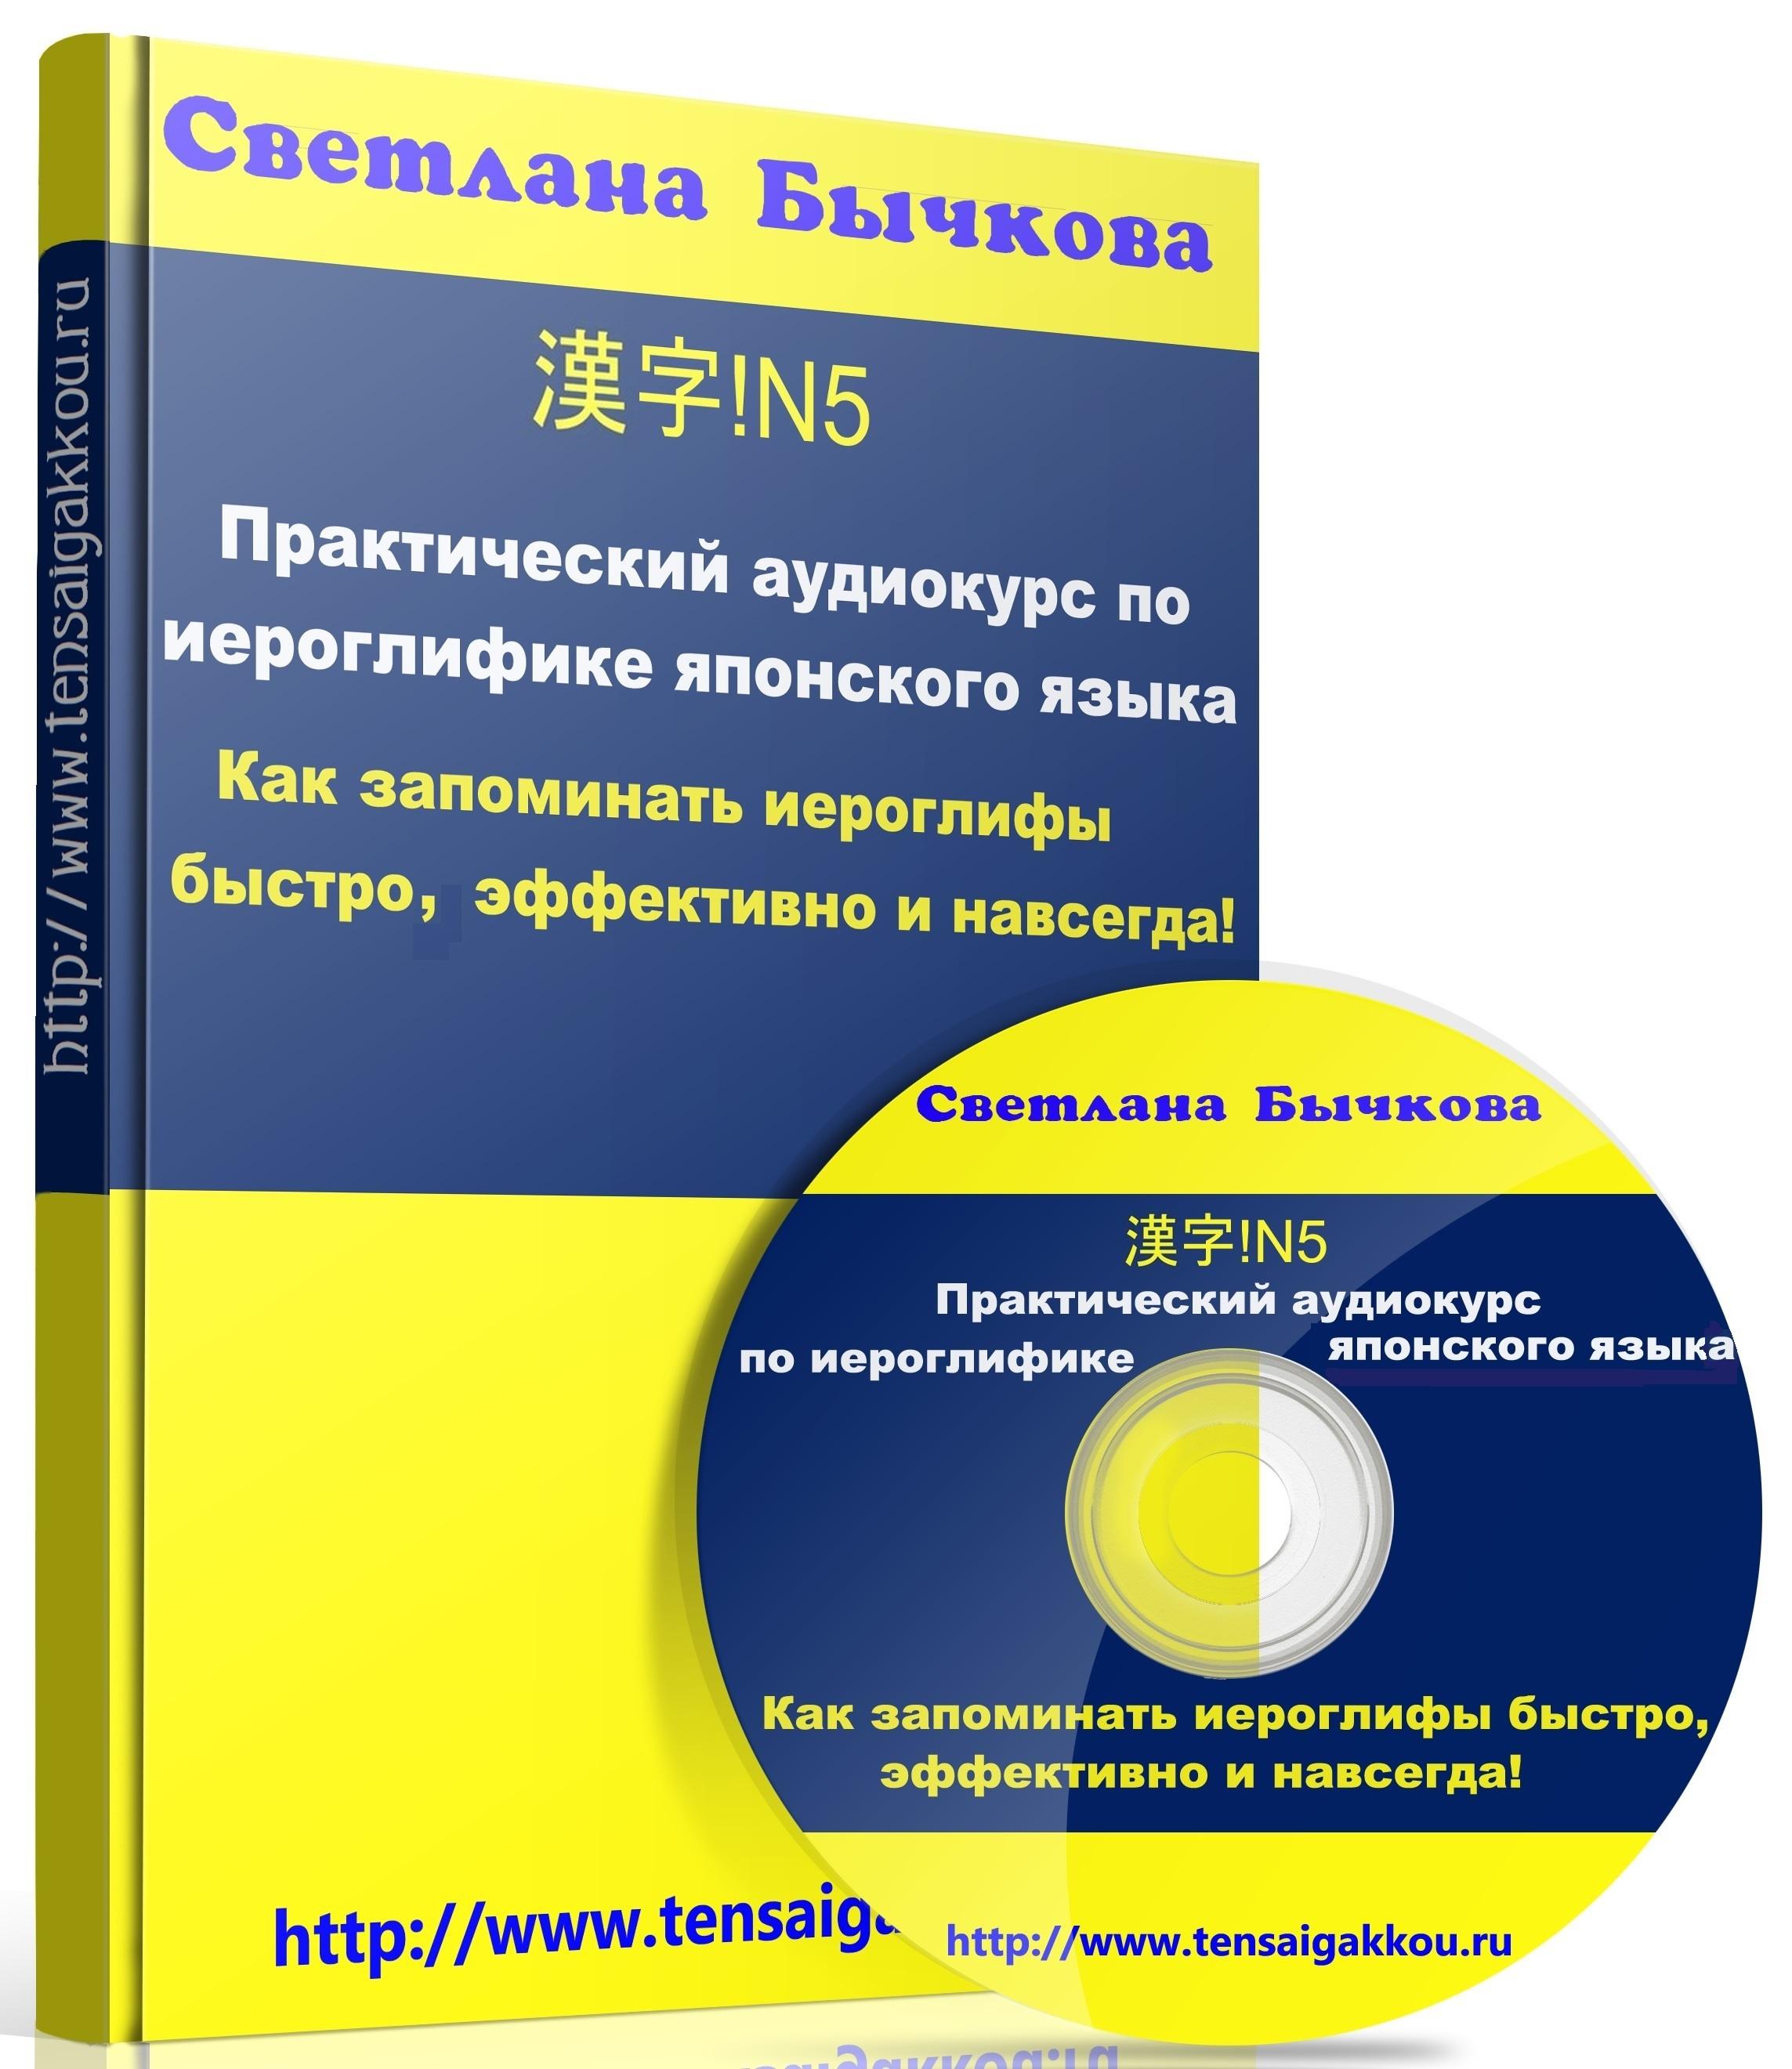 Prakticheskiy-audiokurs-po-ieroglifike-original